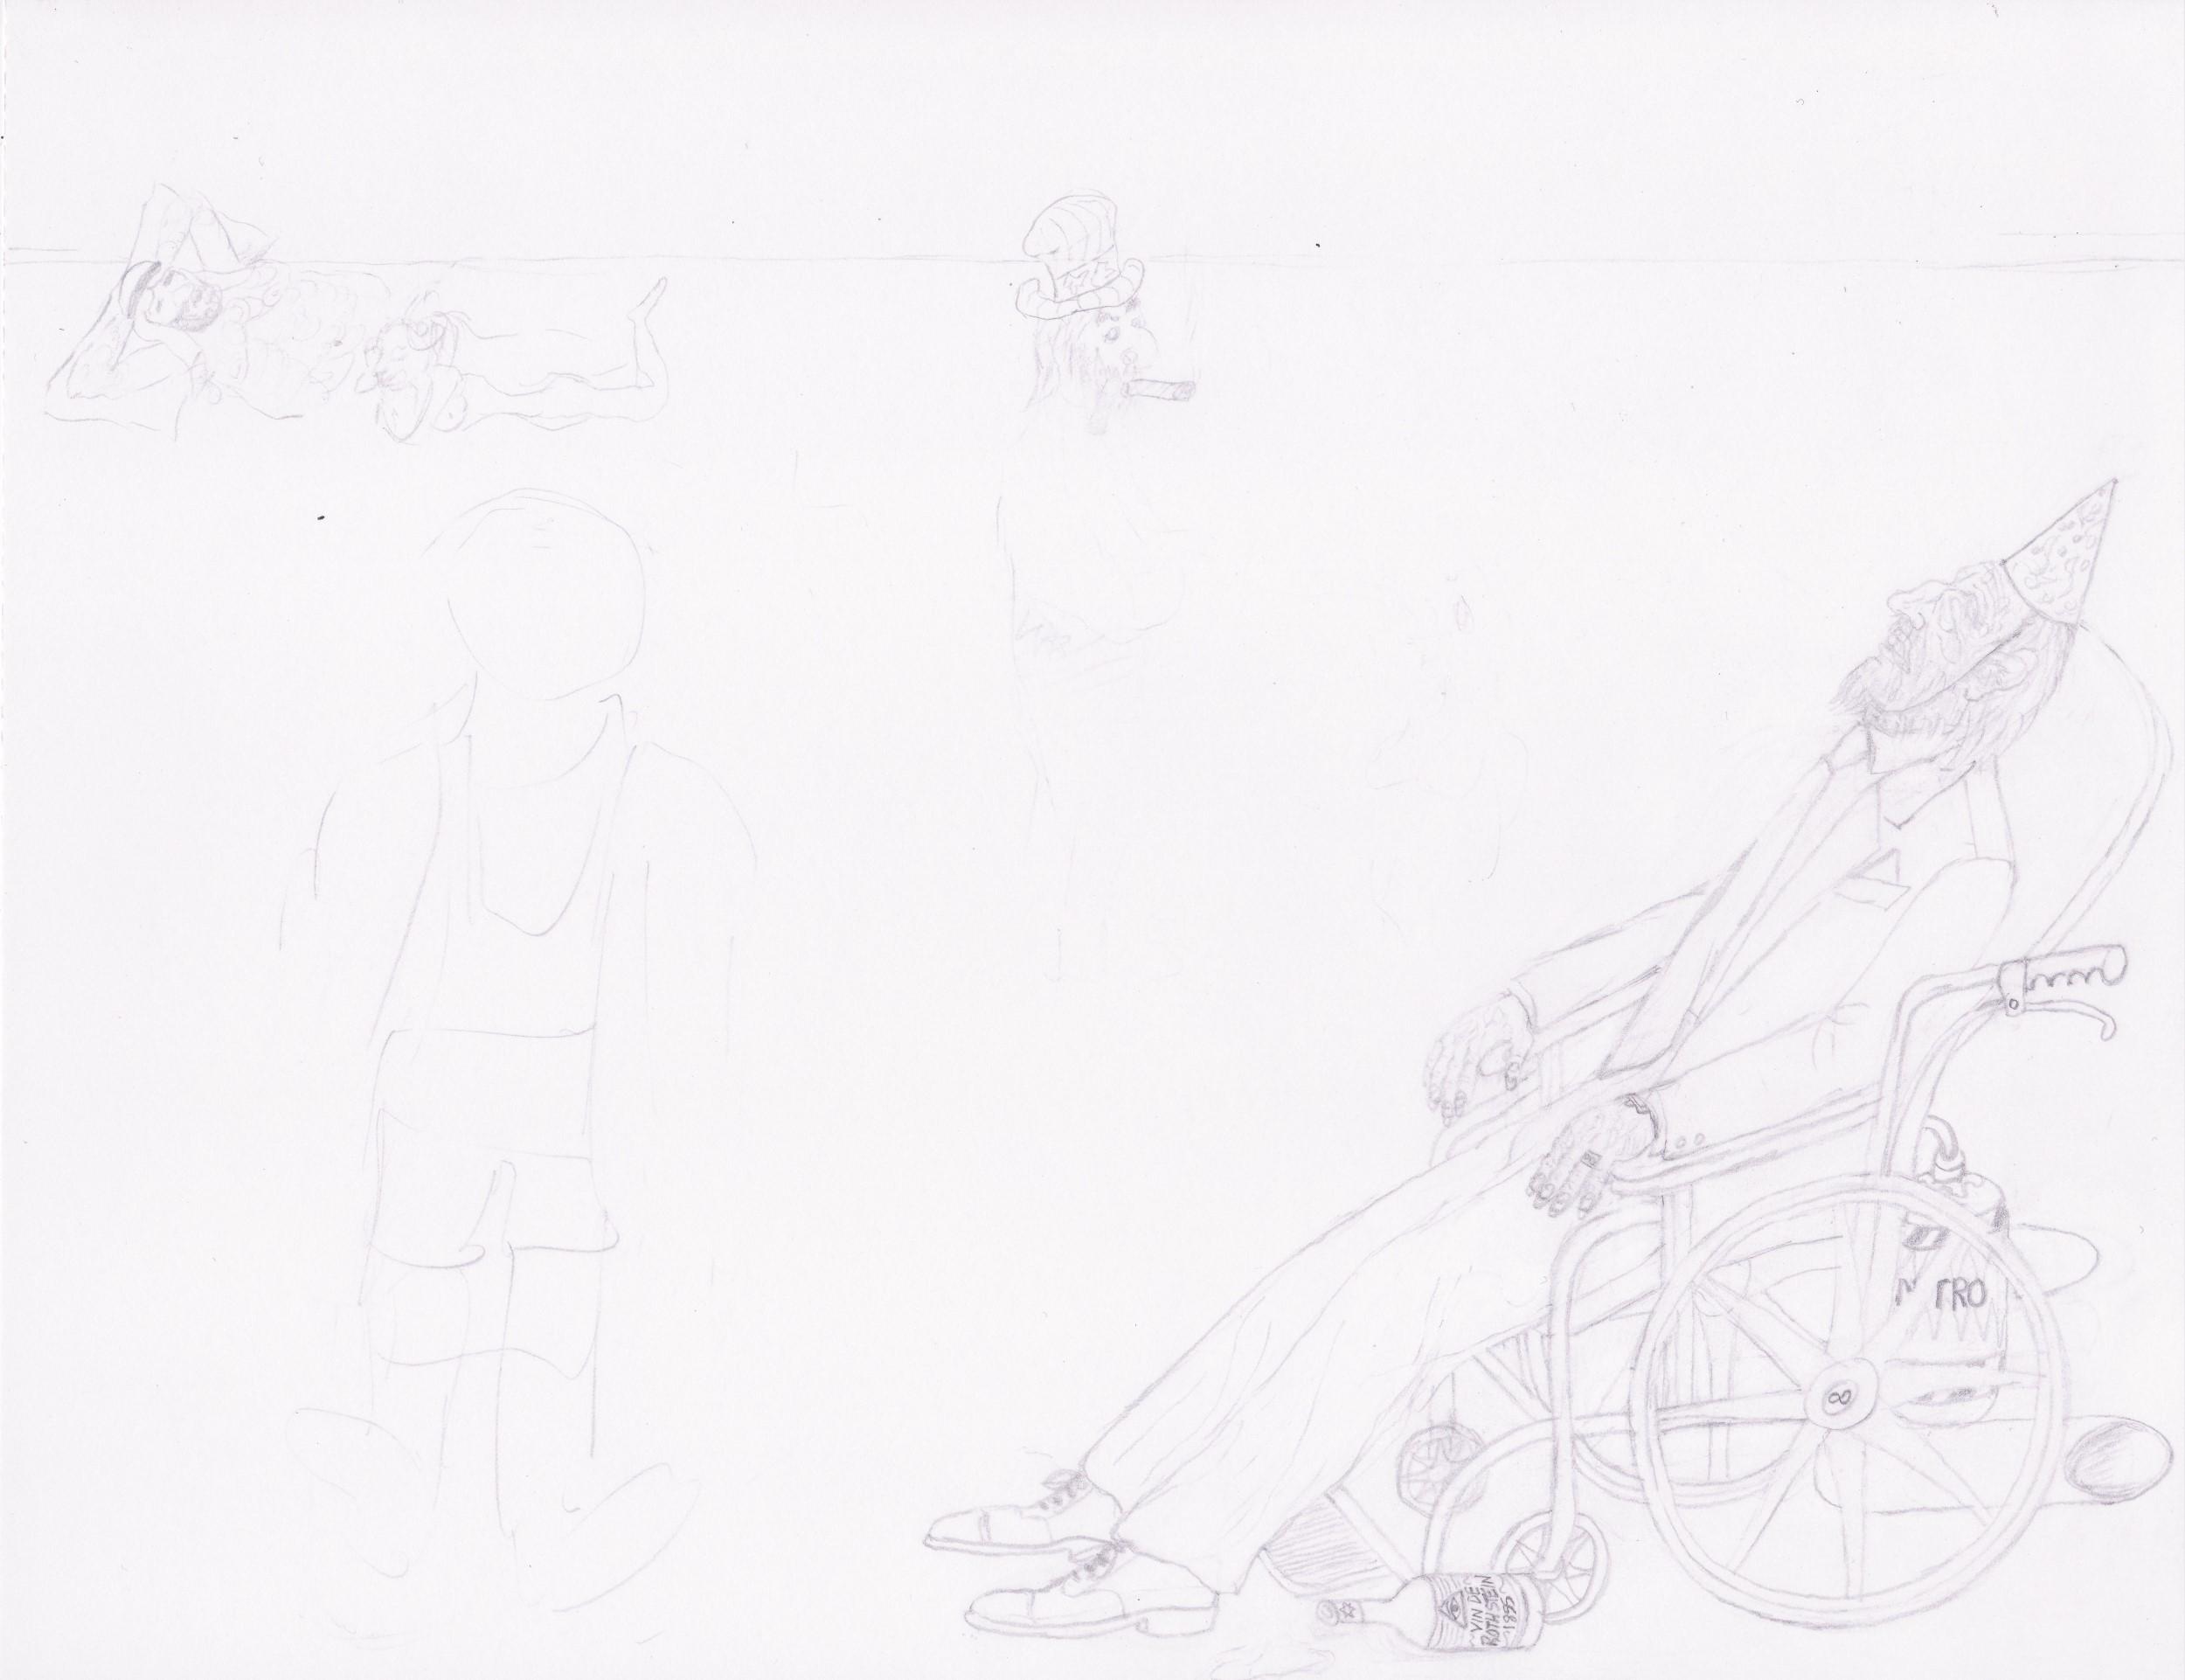 Artwork in Progress 120 Days of Anarchy step 2 (May 10, 2021) SatansSchlongs.com